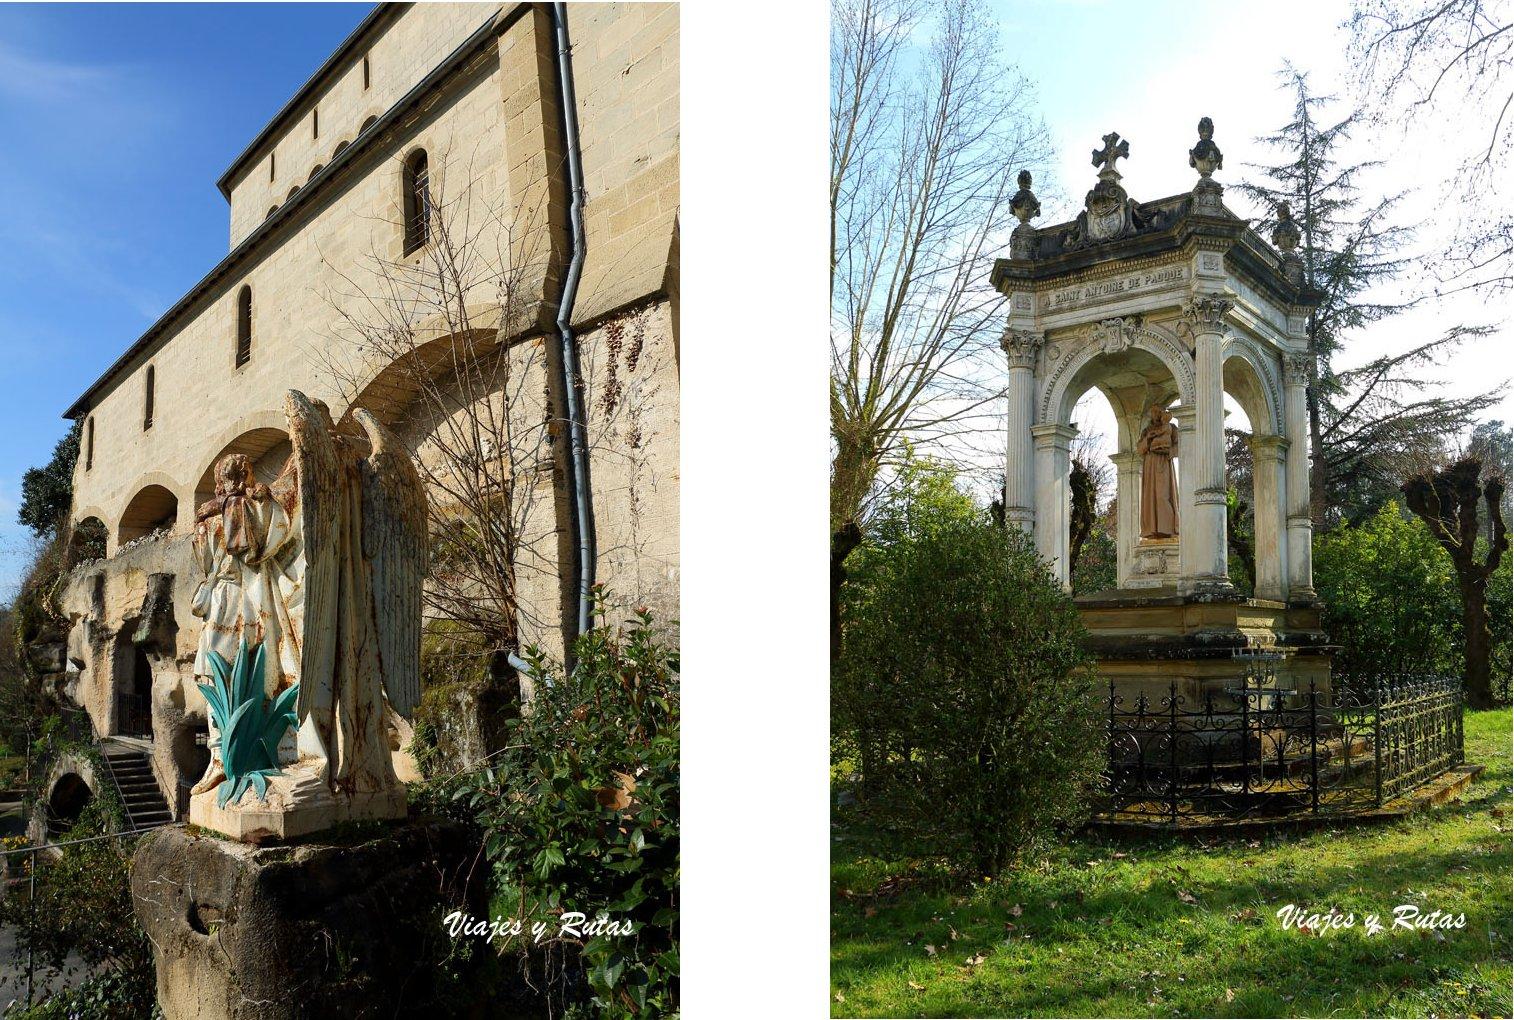 Grutas de San Antonio de Padua en Brive la Gaillarde